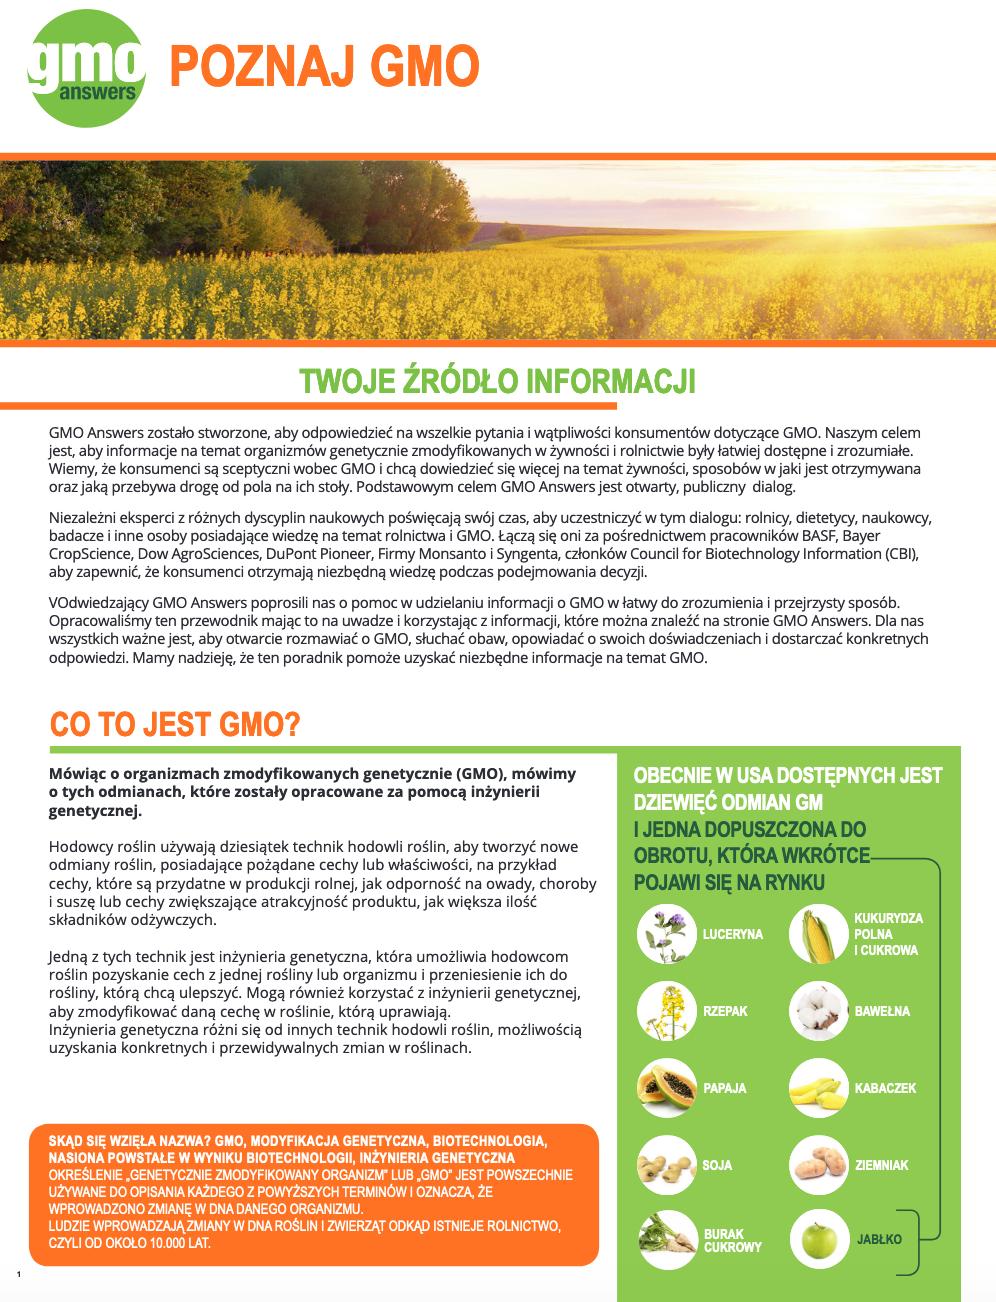 Get to Know GMOs